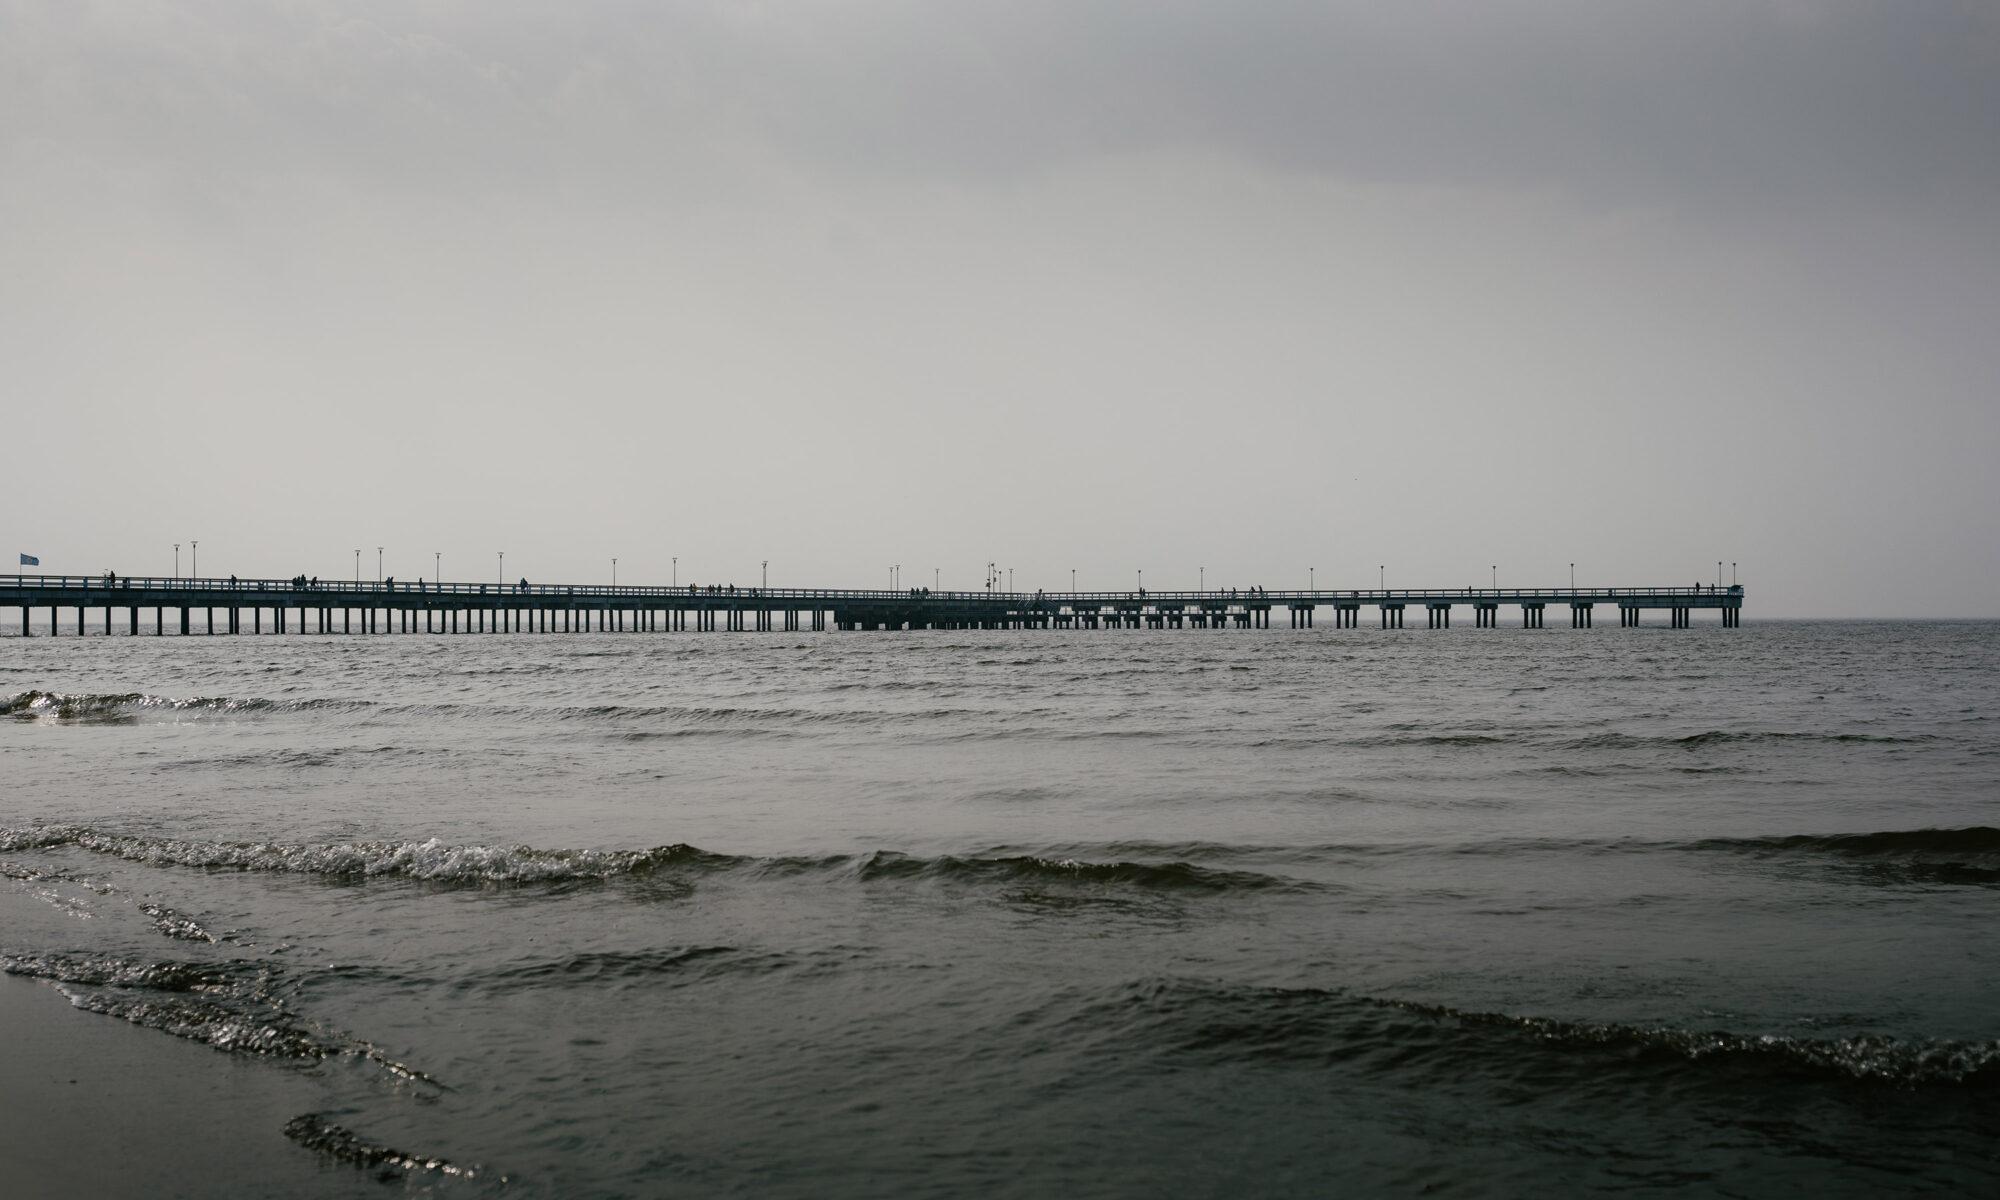 Palanga bridge, Lithuania. Shot with Carl Zeiss Contarex 50mm f2